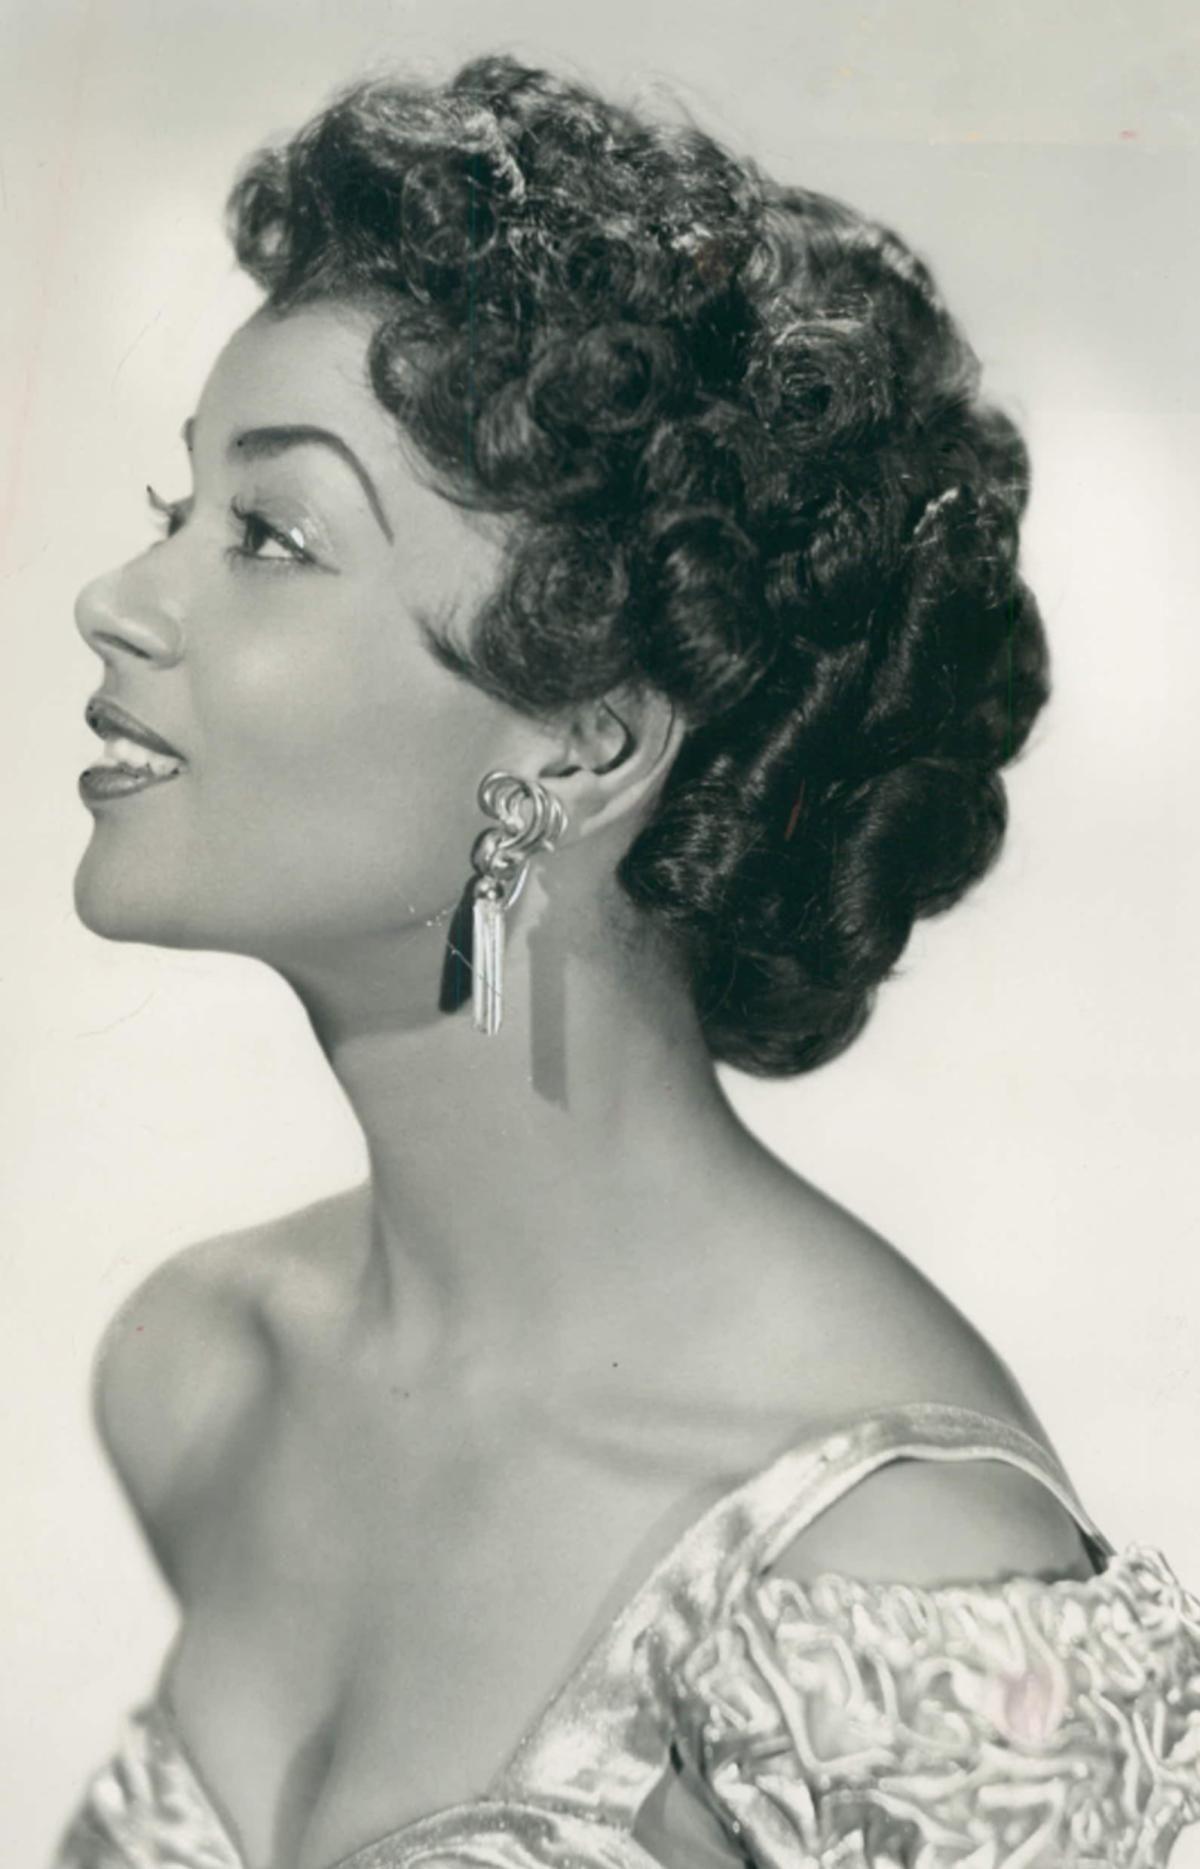 Sheila Guyse